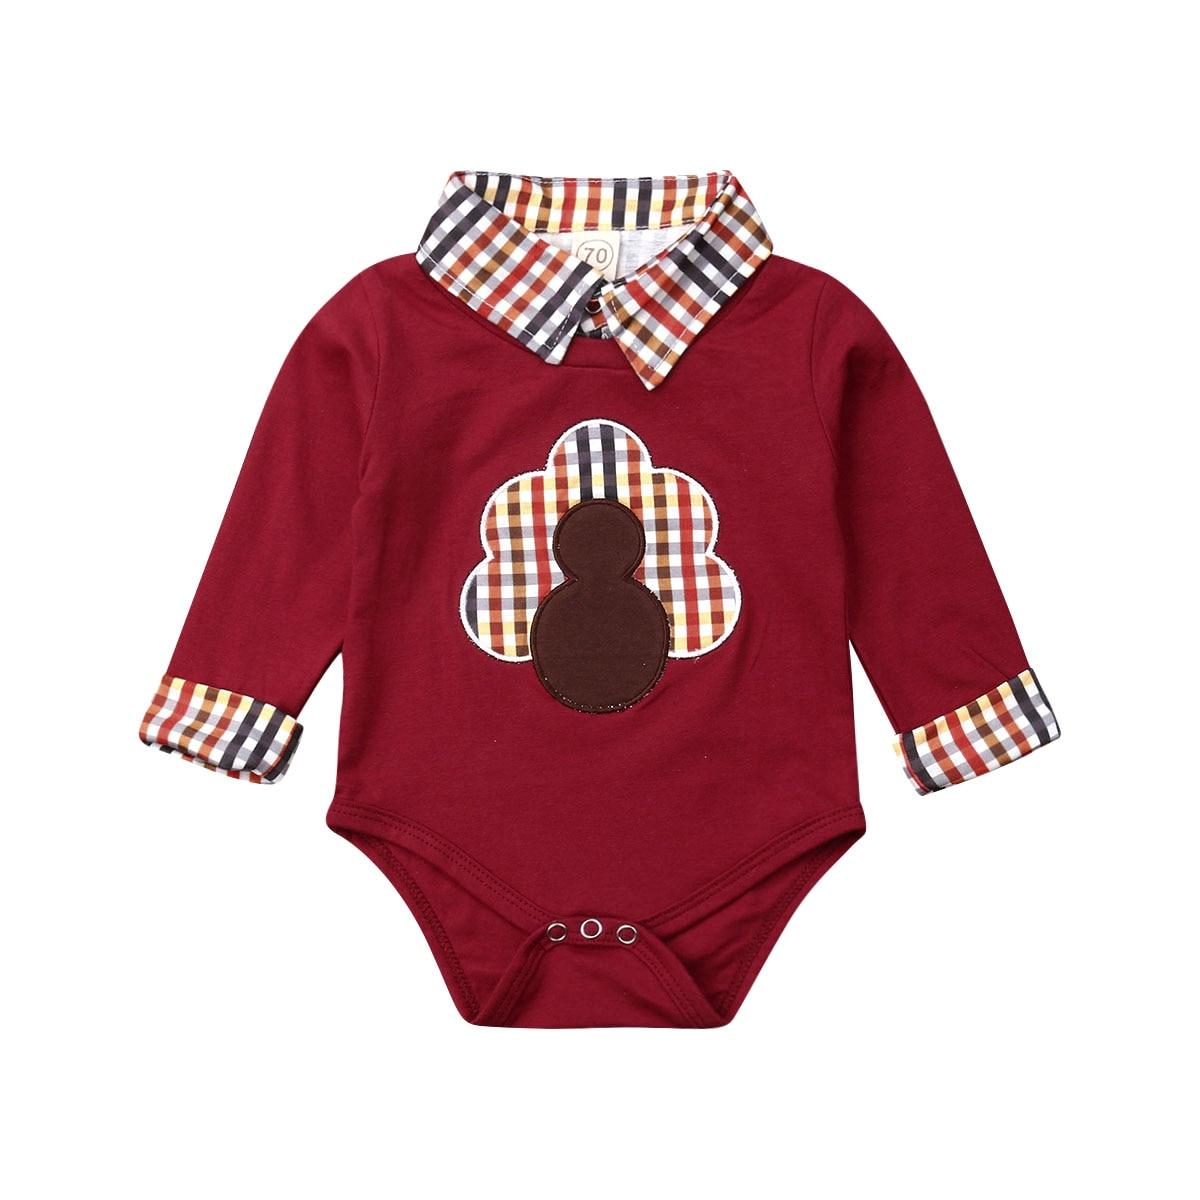 Herbst Kleidung Neugeborenen Baby Jungen Kleidung Gentleman Thanksgiving Tag Strampler Overall Outfit Kleidung Set 0-18 monate